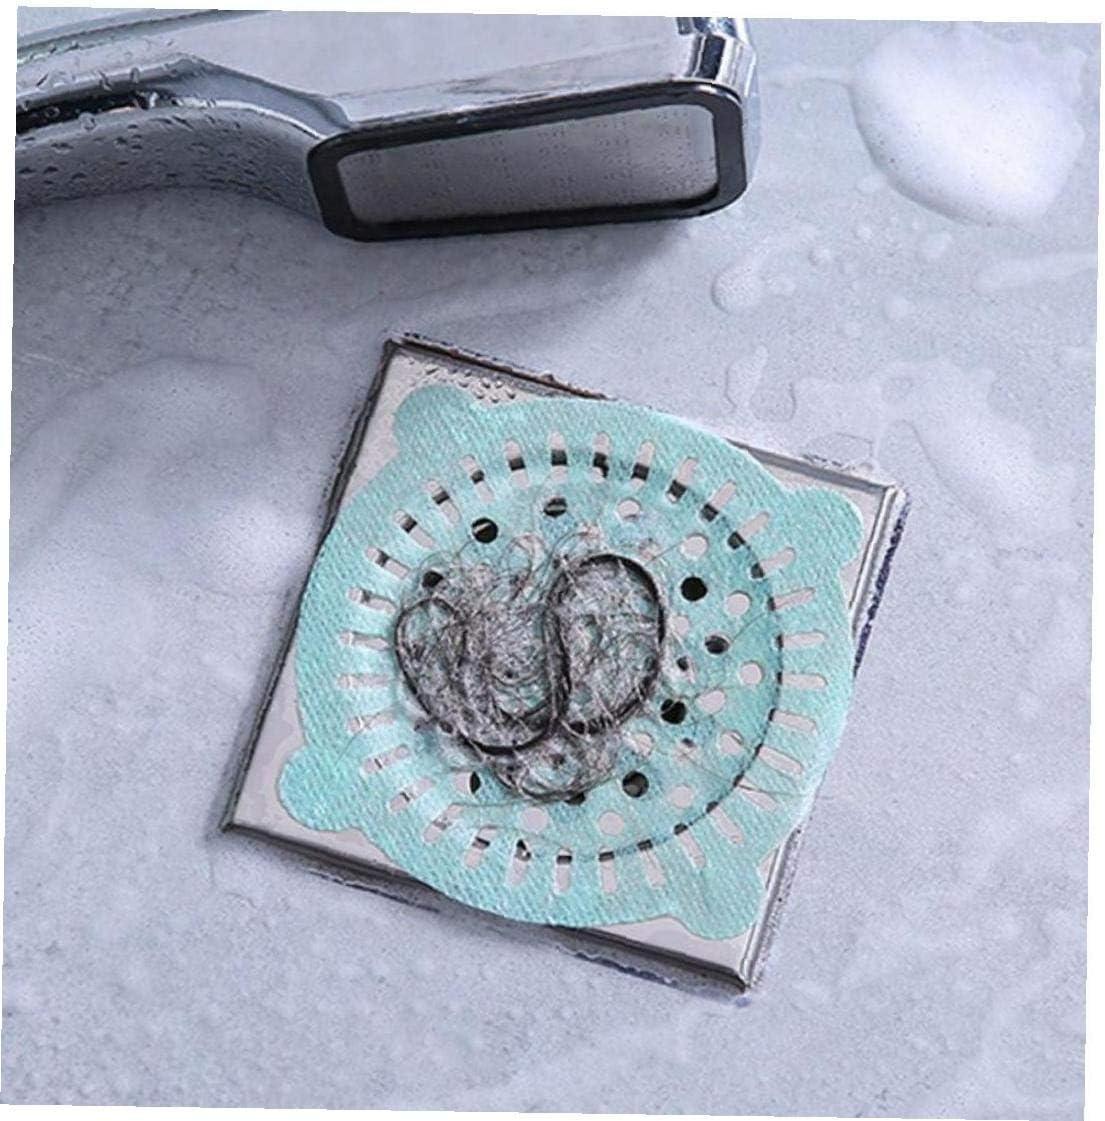 PiniceCore Disposable Hair Catcher Shower Filter Sink Plug Floor Drain Filter Anti-Blocking Bath Cap Bathroom Stopper Drain Plug